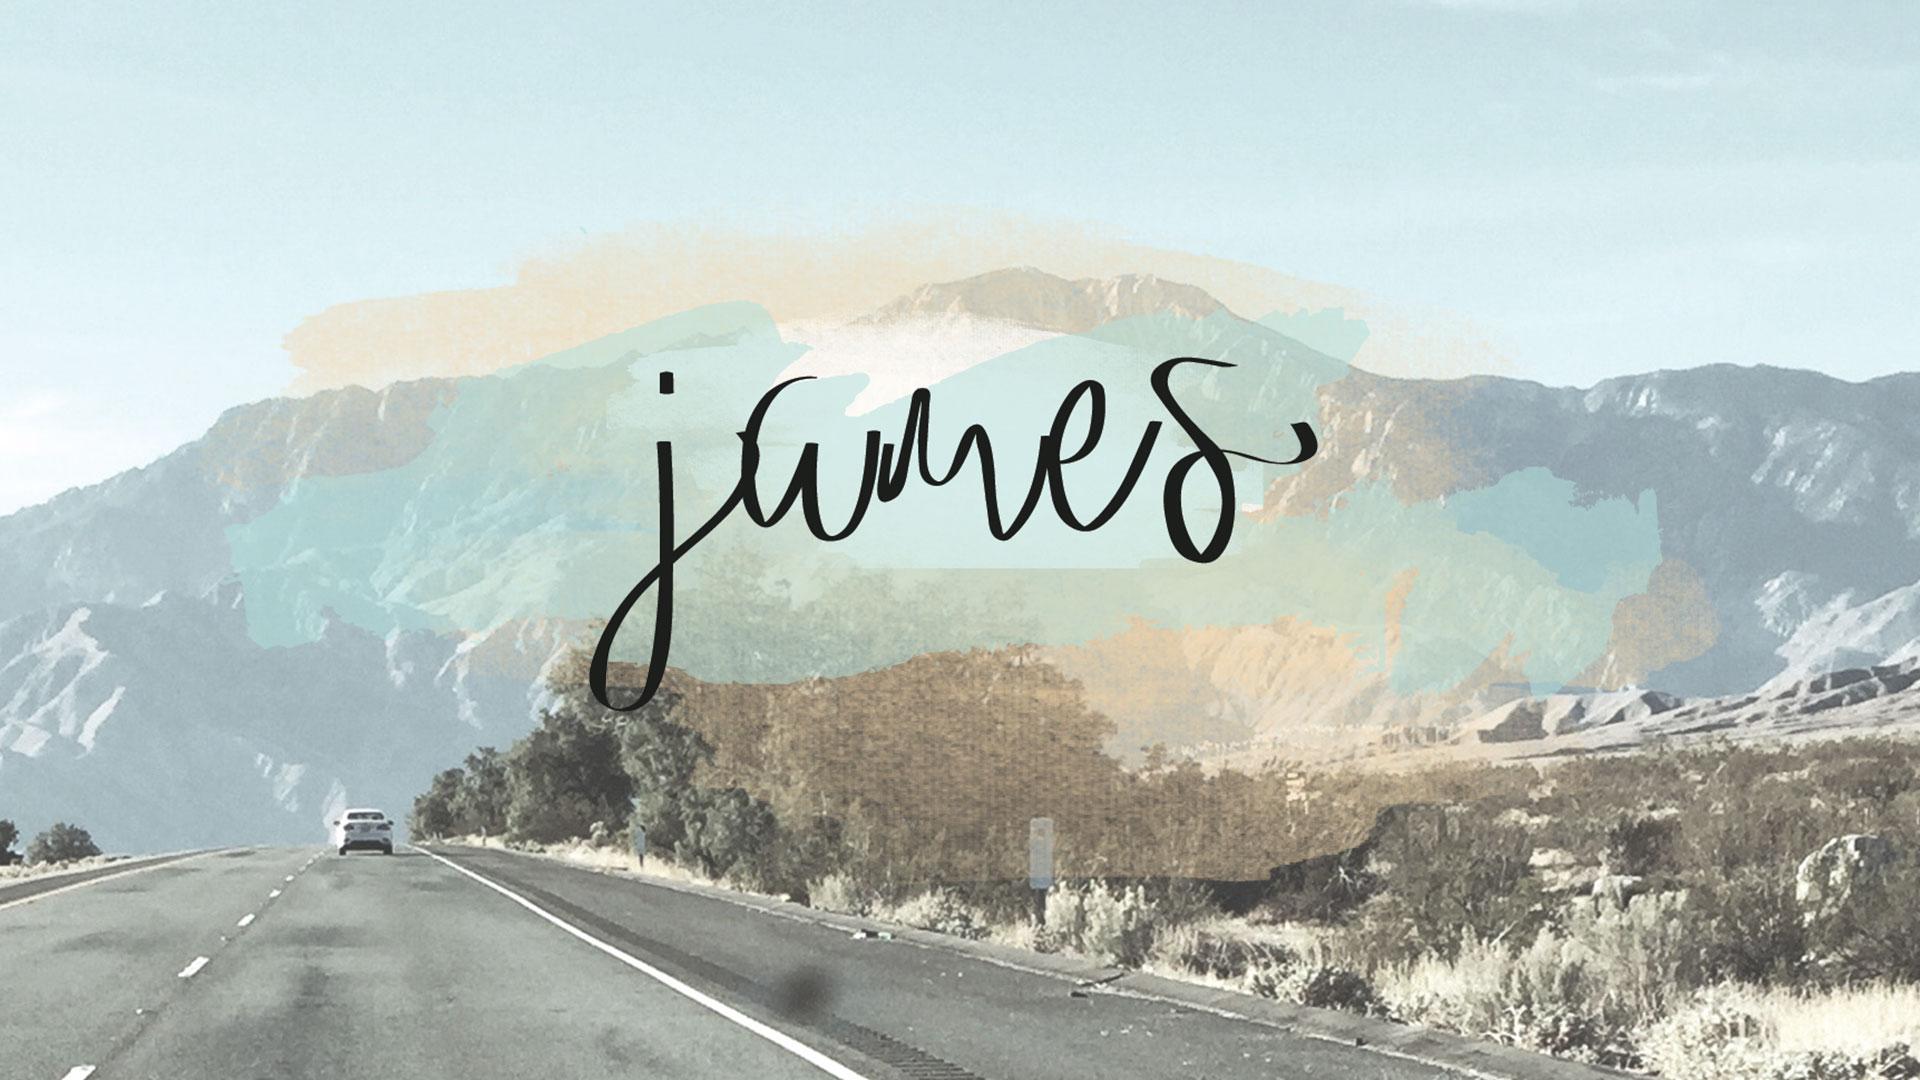 James Chapter 2 – Women